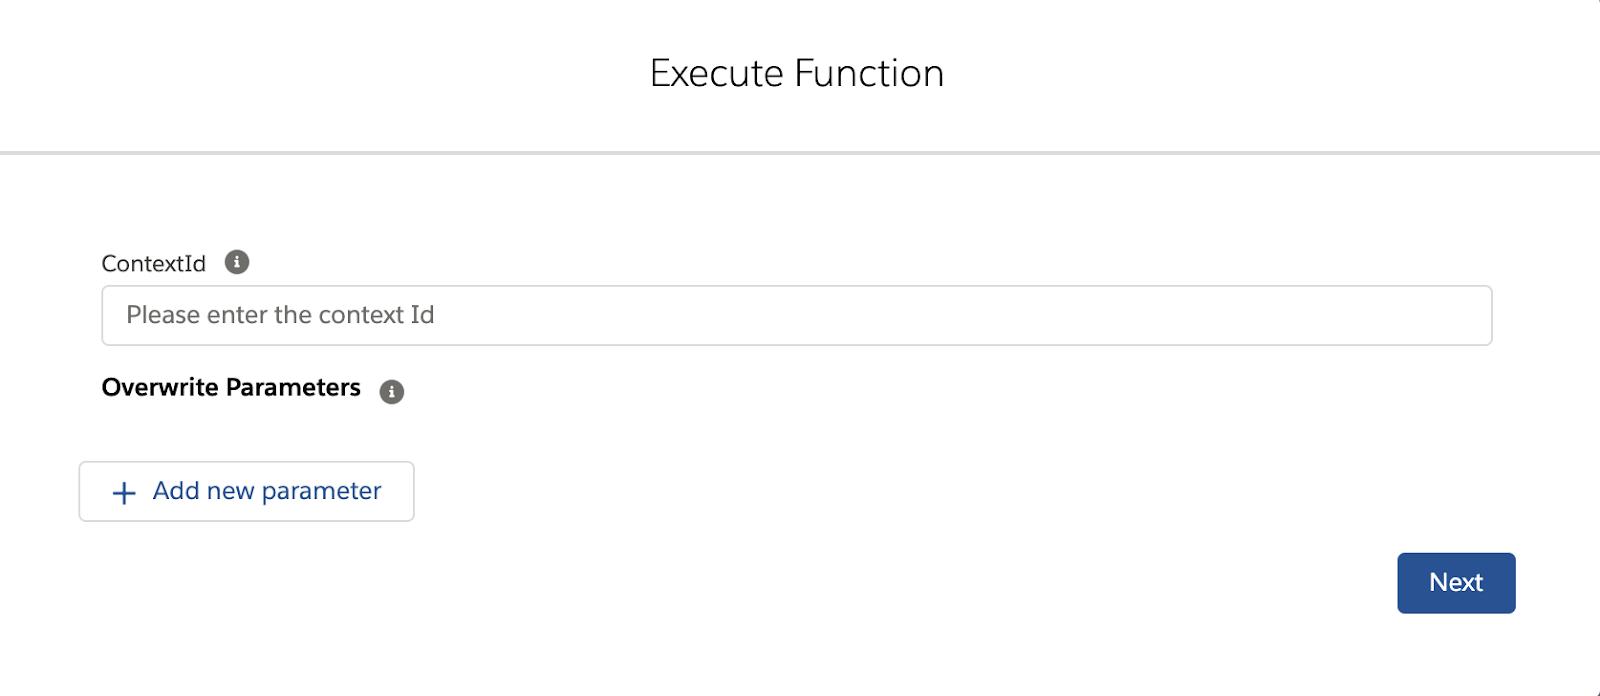 Function execution modal